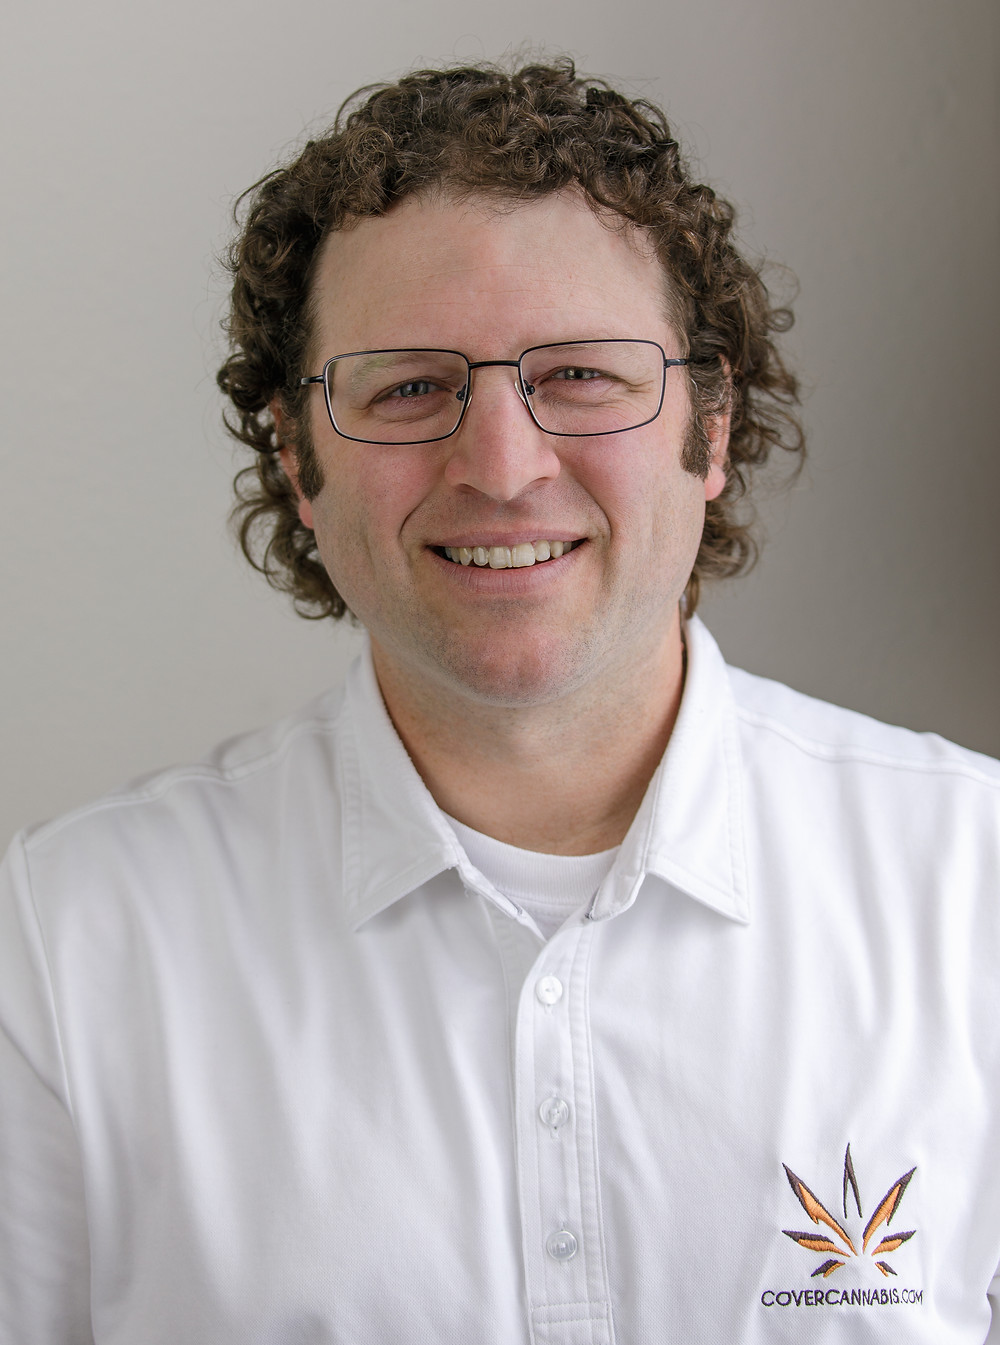 Meet Our New Board Member: Michael Gordon